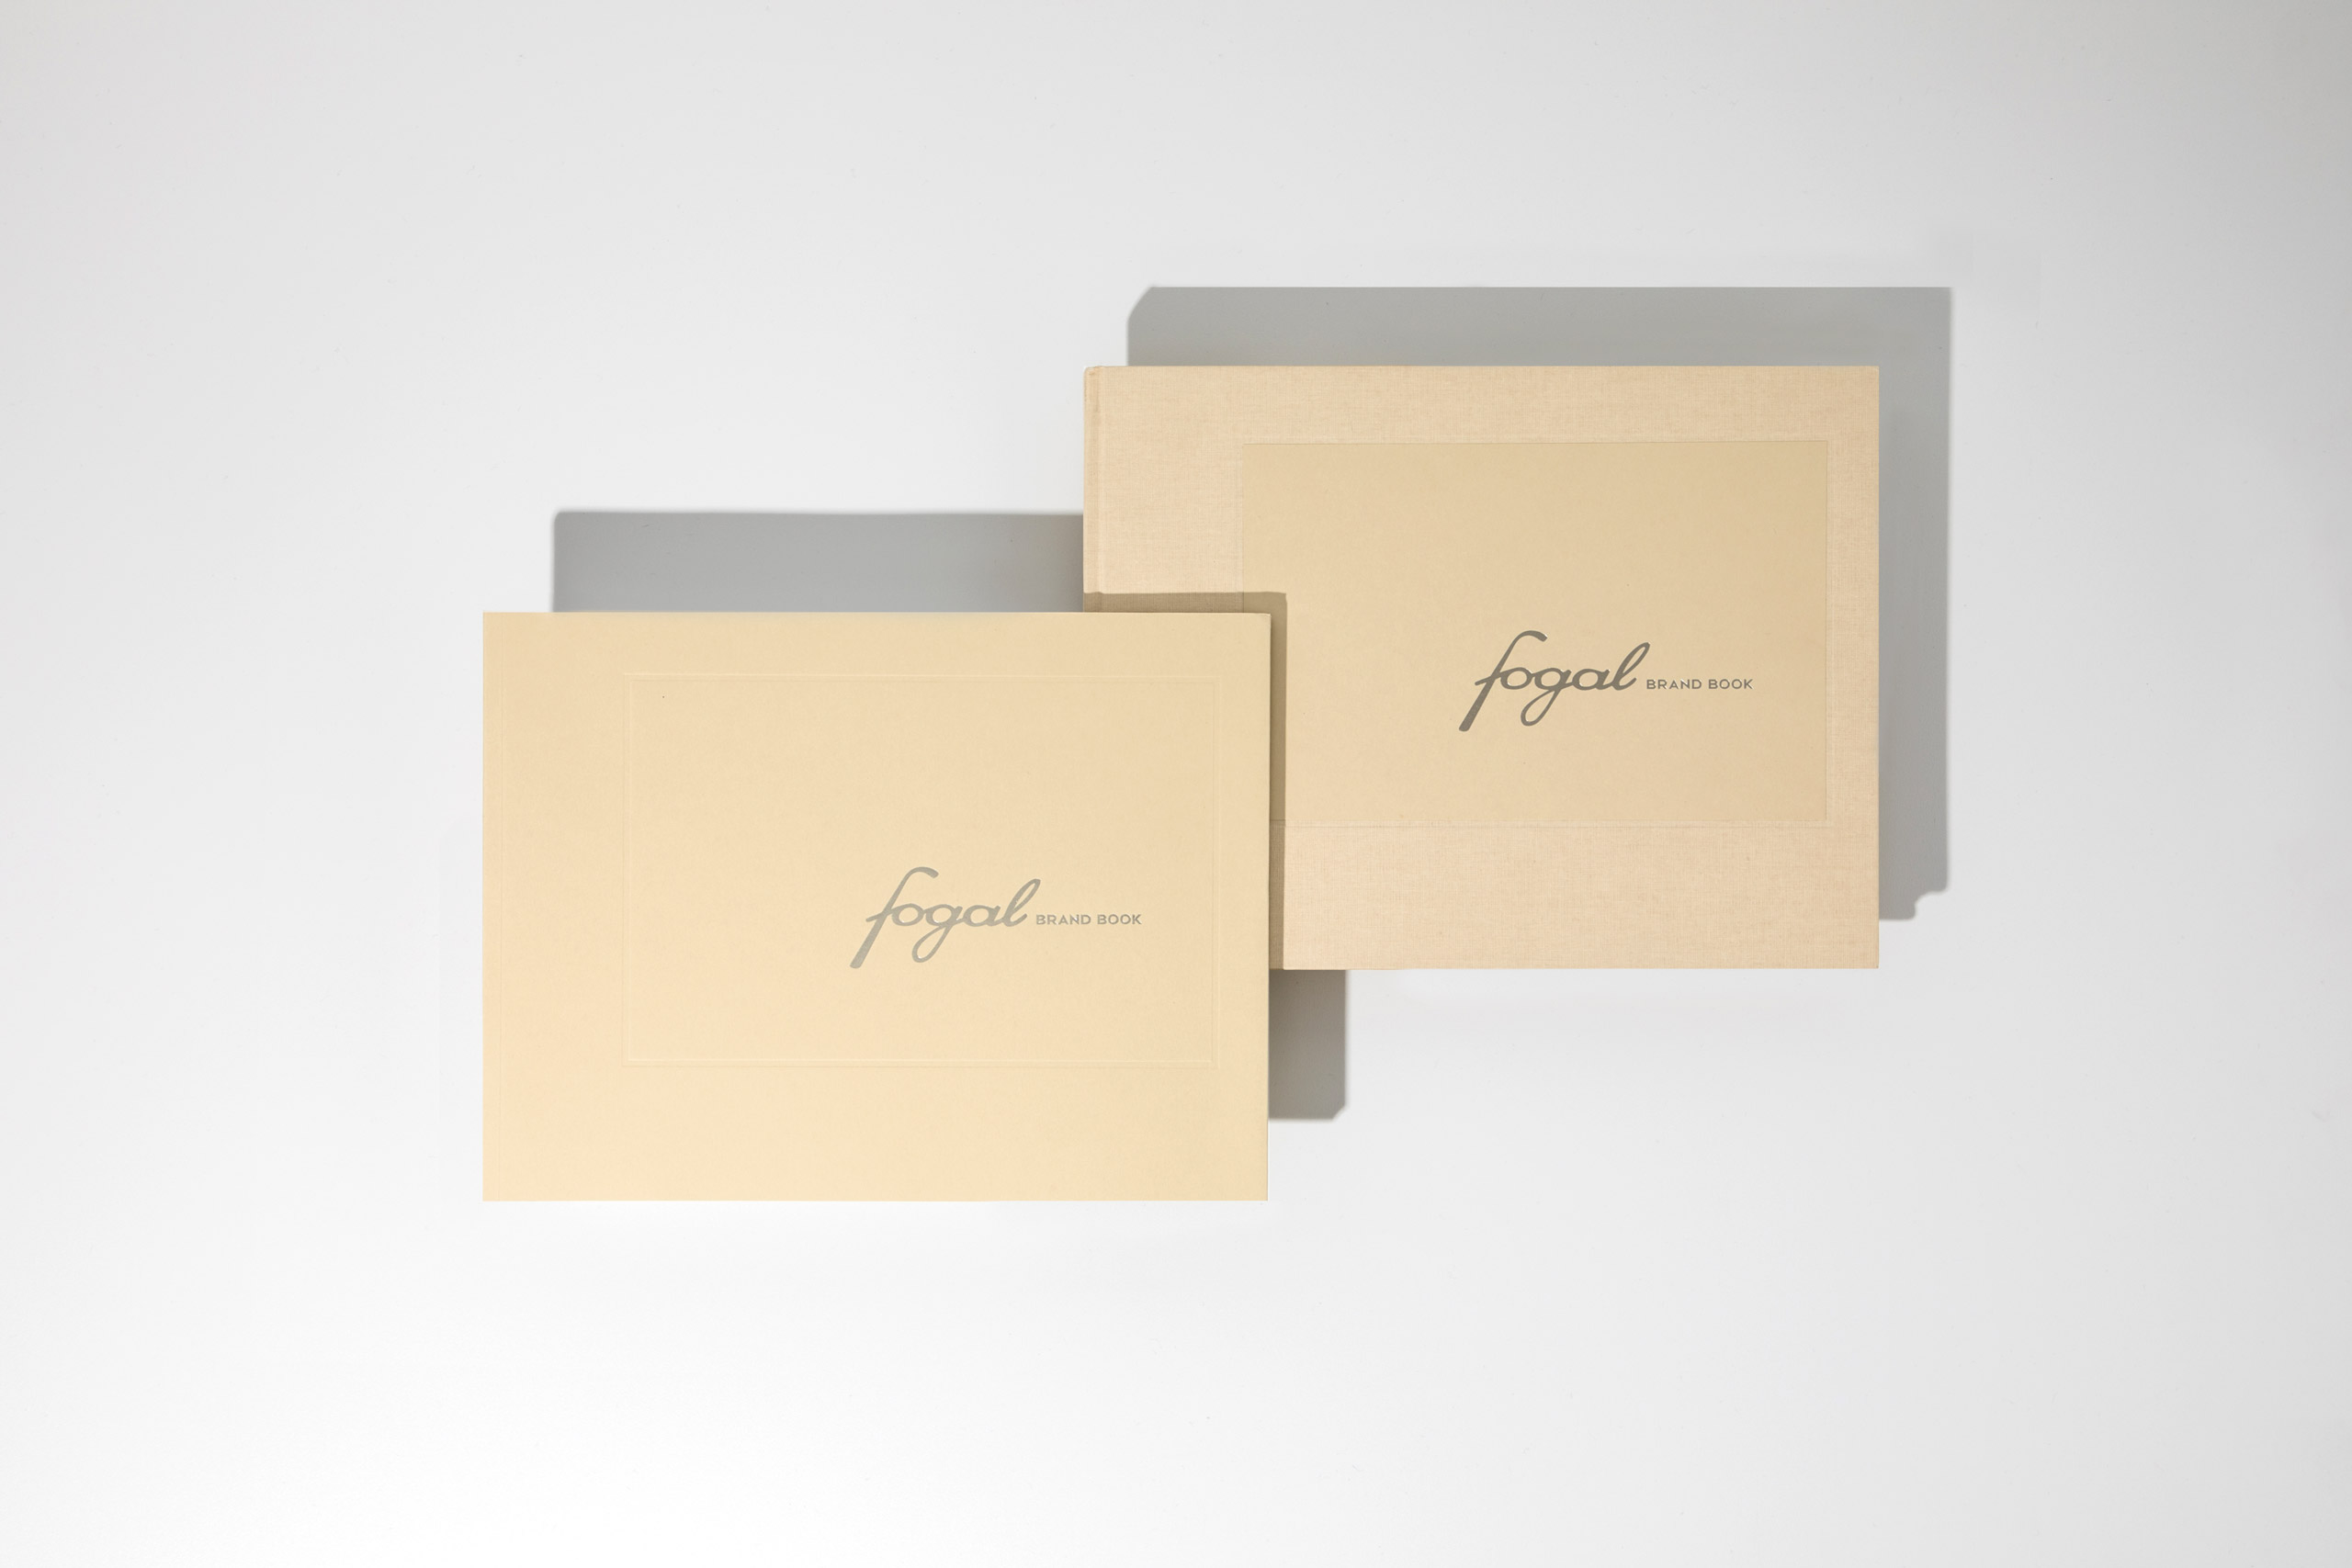 fogal-brandbook-1